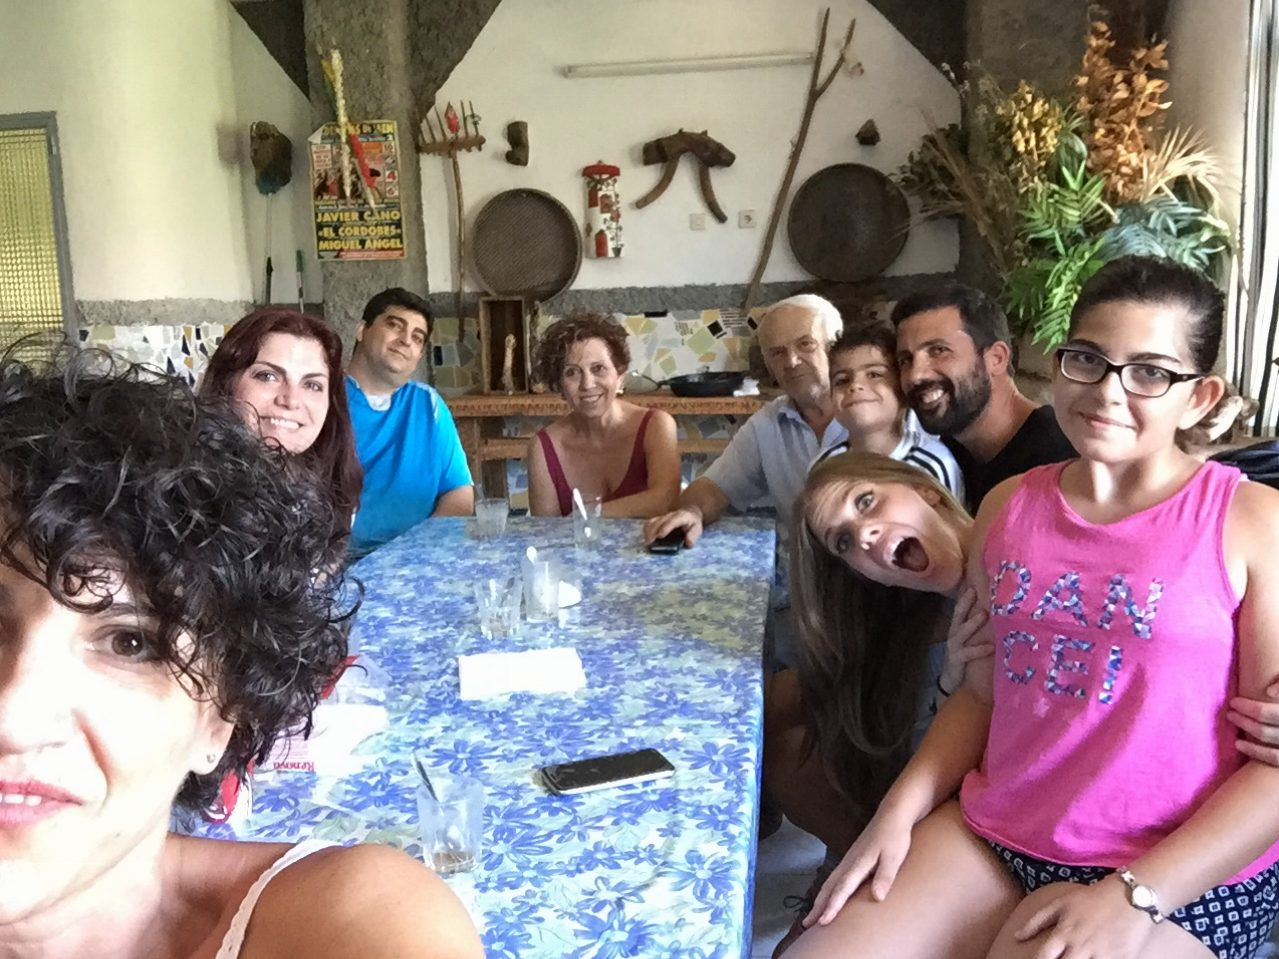 jaen, valdepeñas de jaen, vacaciones, holidays, brothertrip, missclov, familia, family